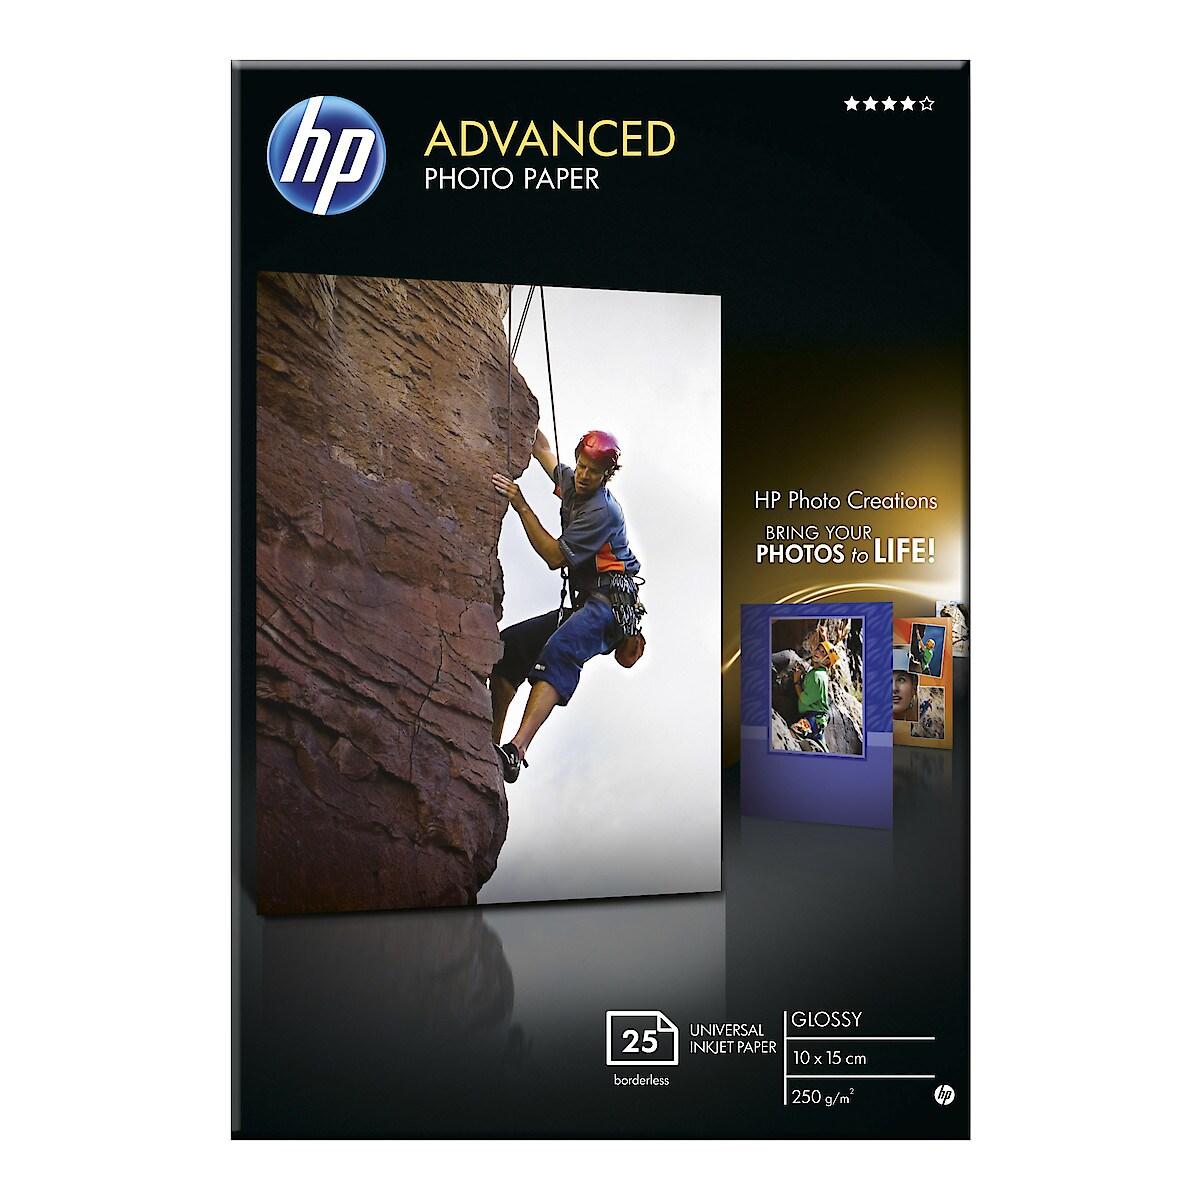 Fotopapper 10x15 cm HP Advanced photo paper, Glossy